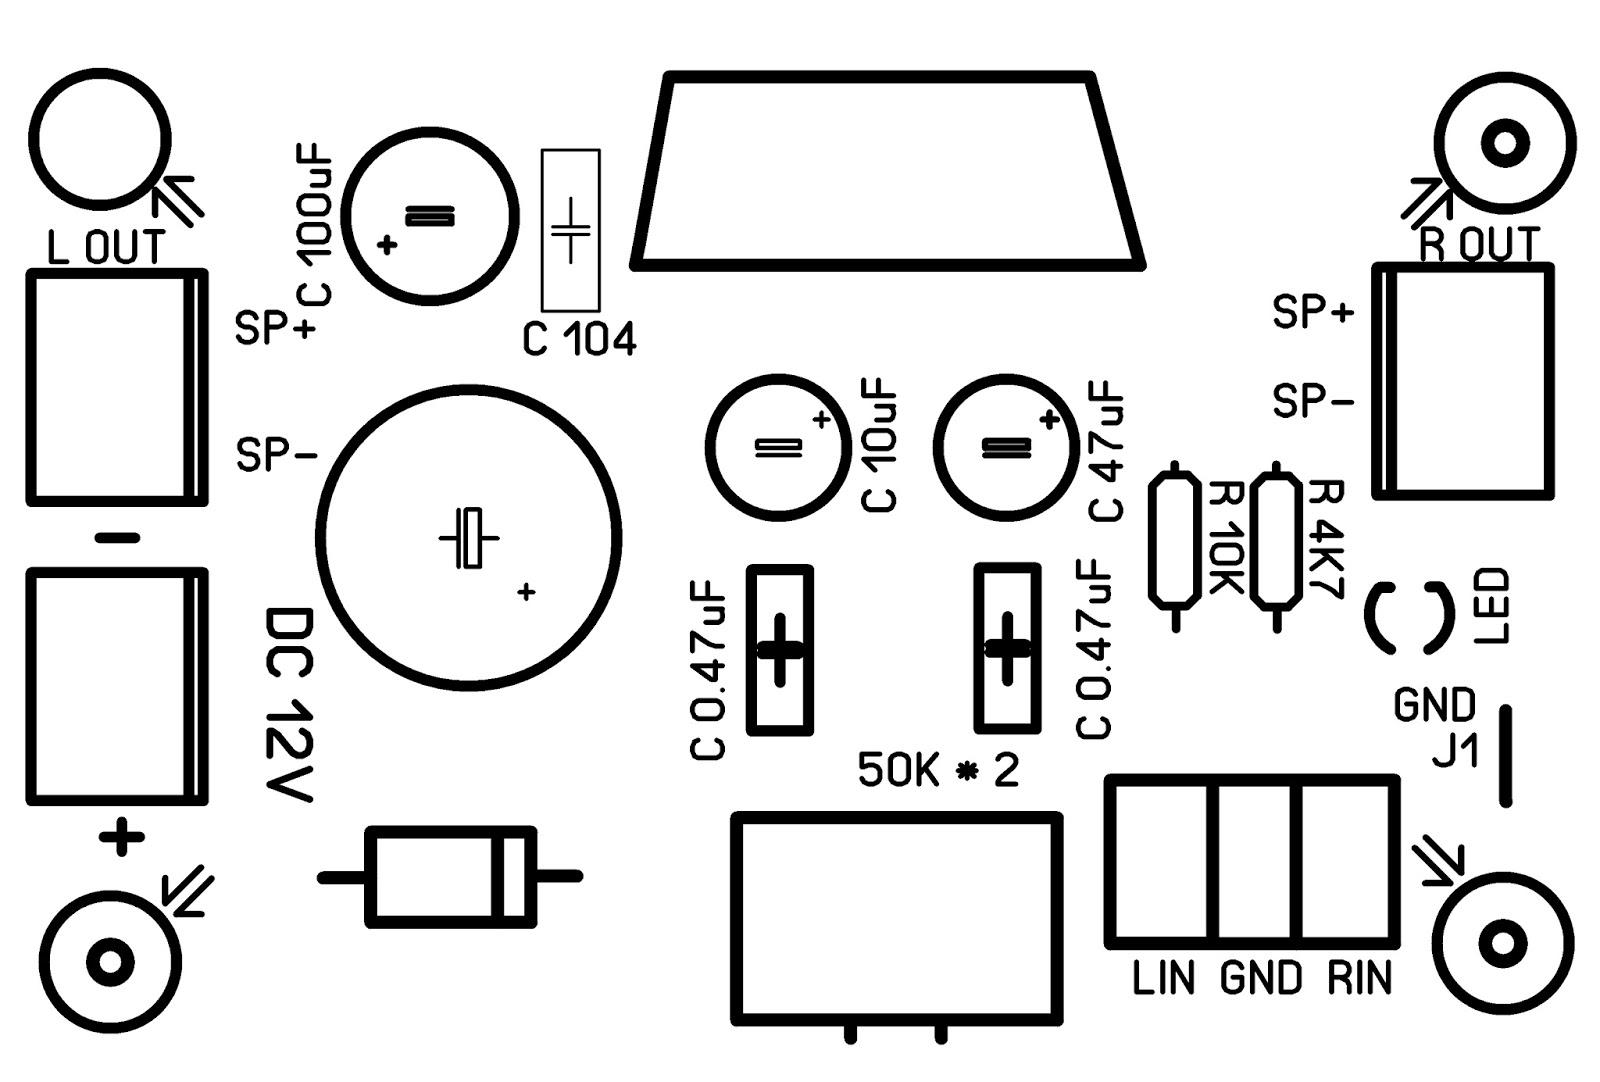 circuit diagramgif